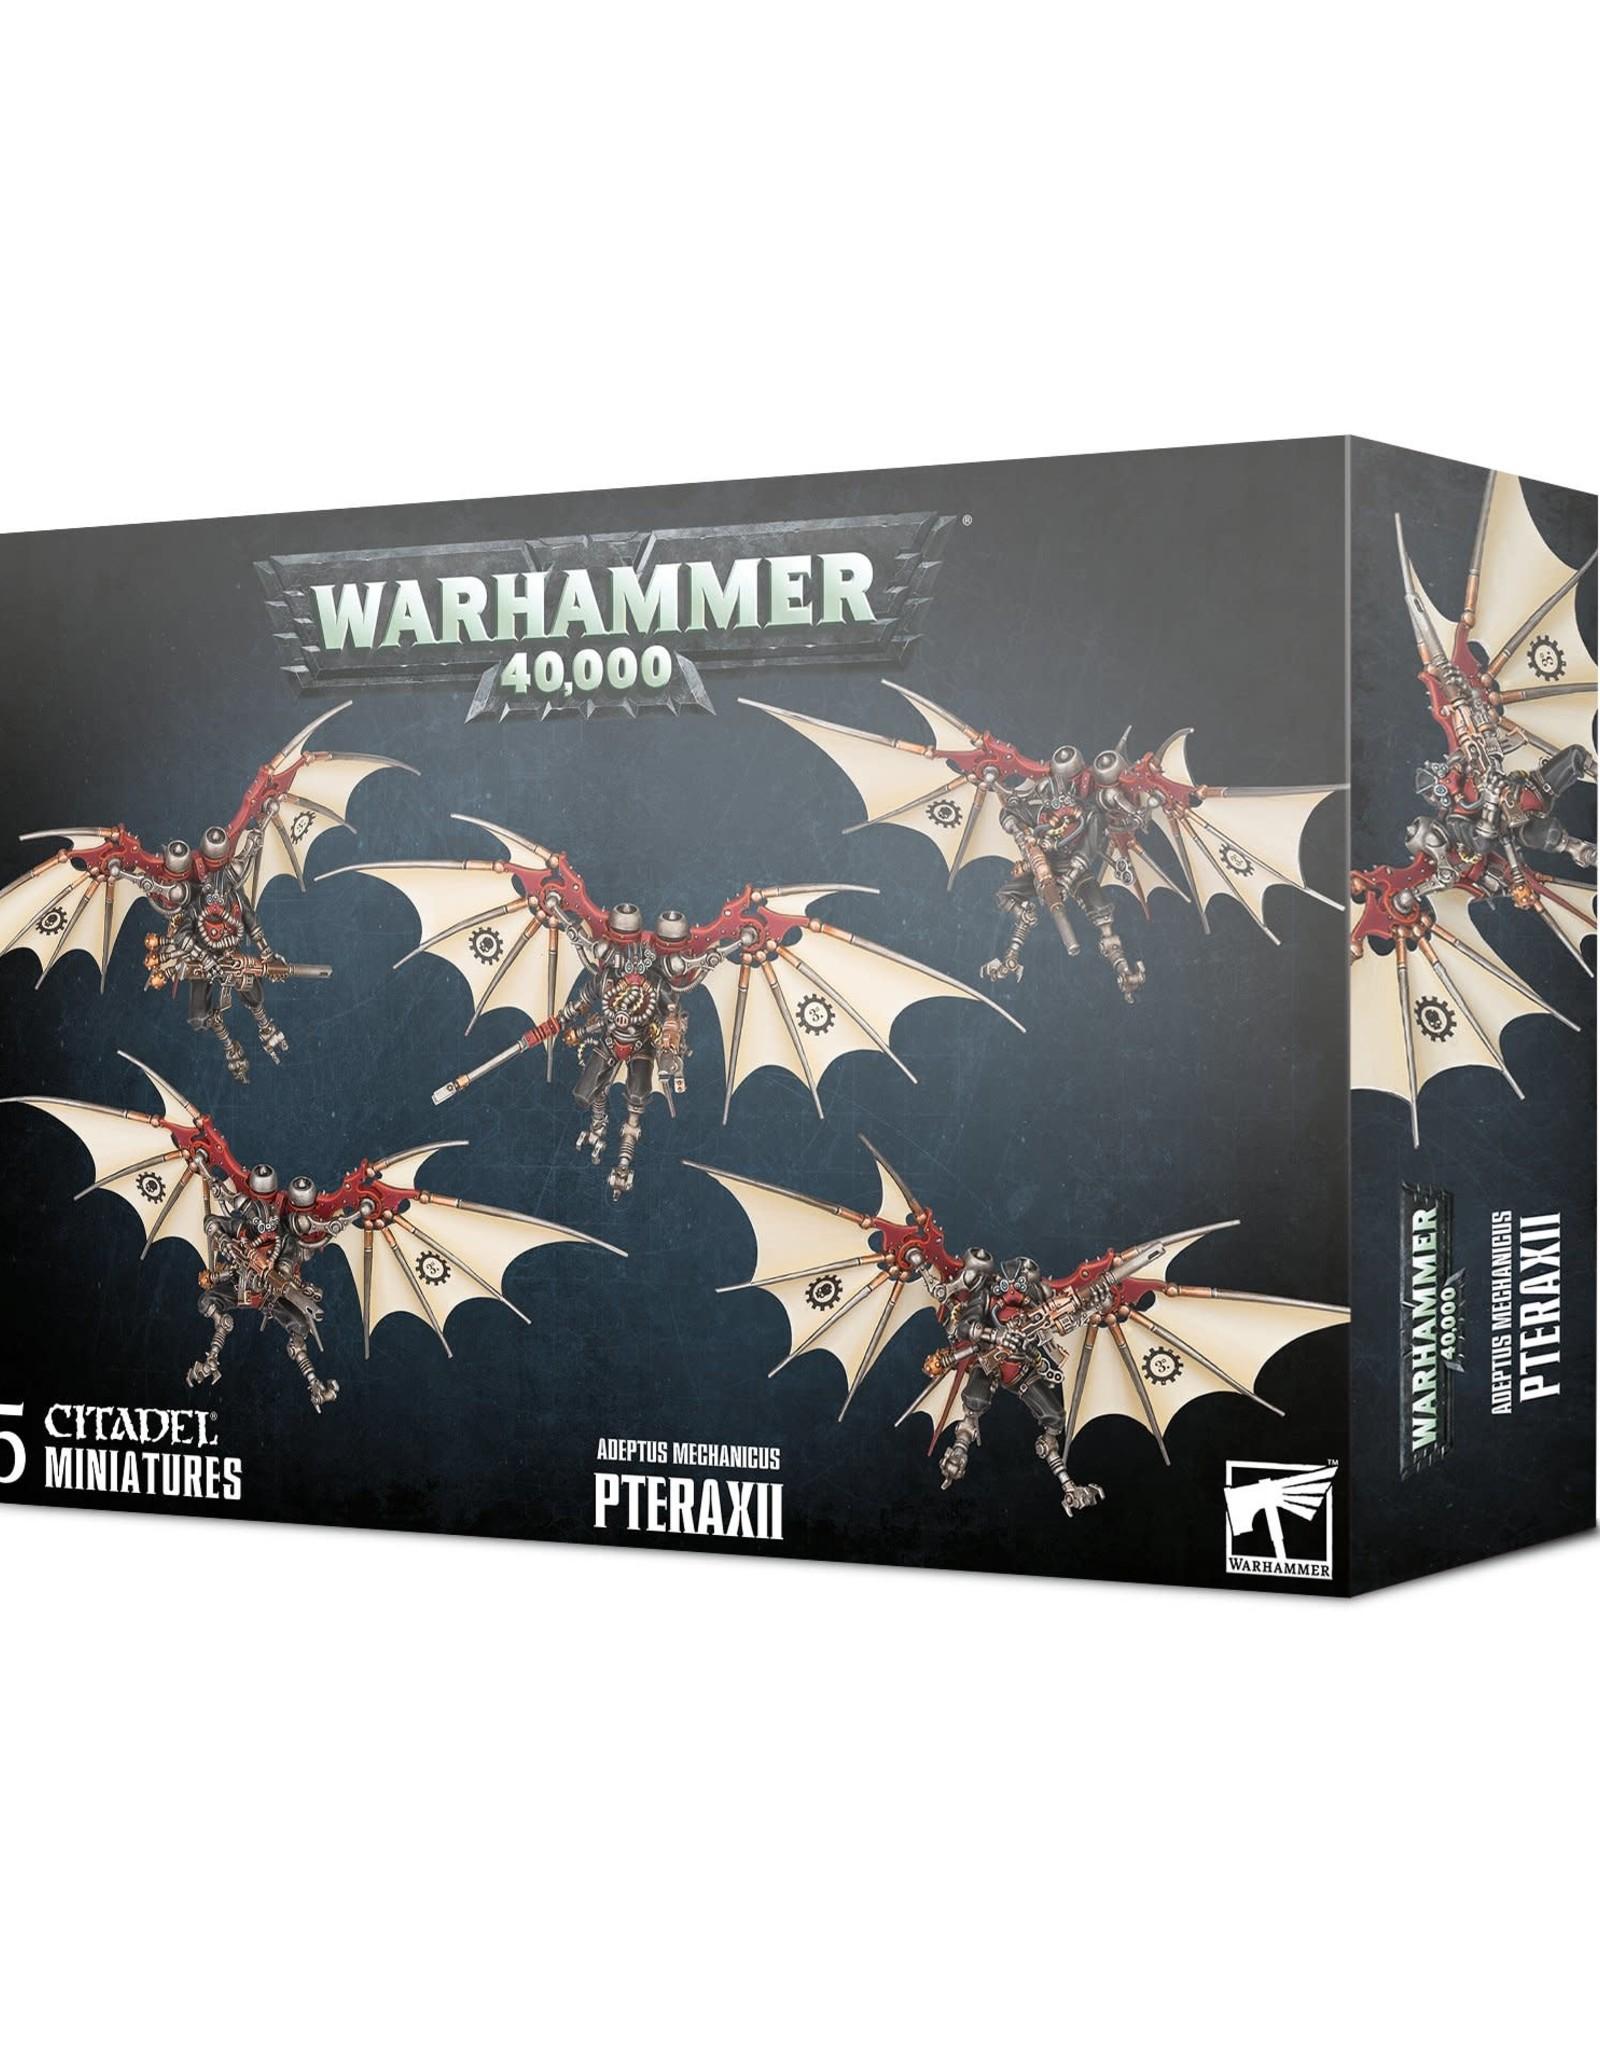 Warhammer 40K Adeptus Mechanicus: Pteraxii